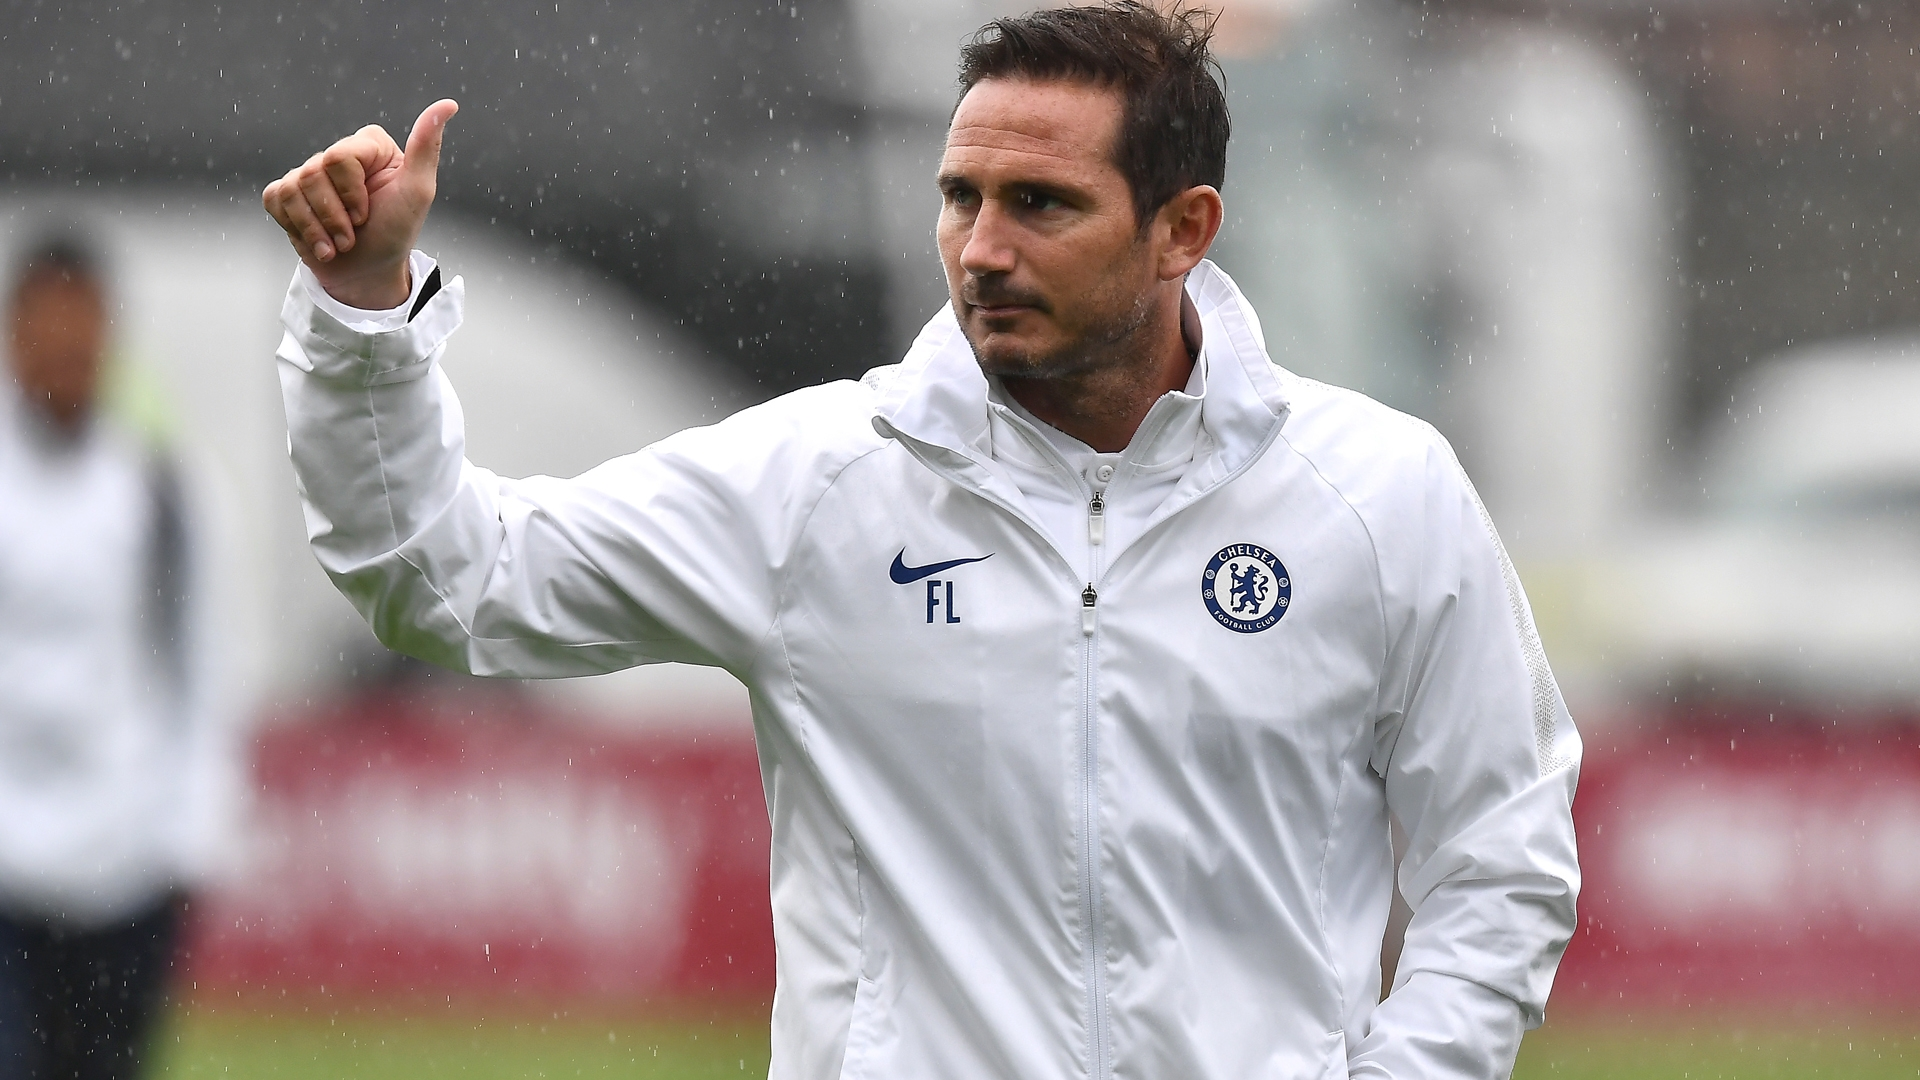 Chelsea boss Frank Lampard makes promise to Olivier Giroud after failed Tottenham transfer - Bóng Đá